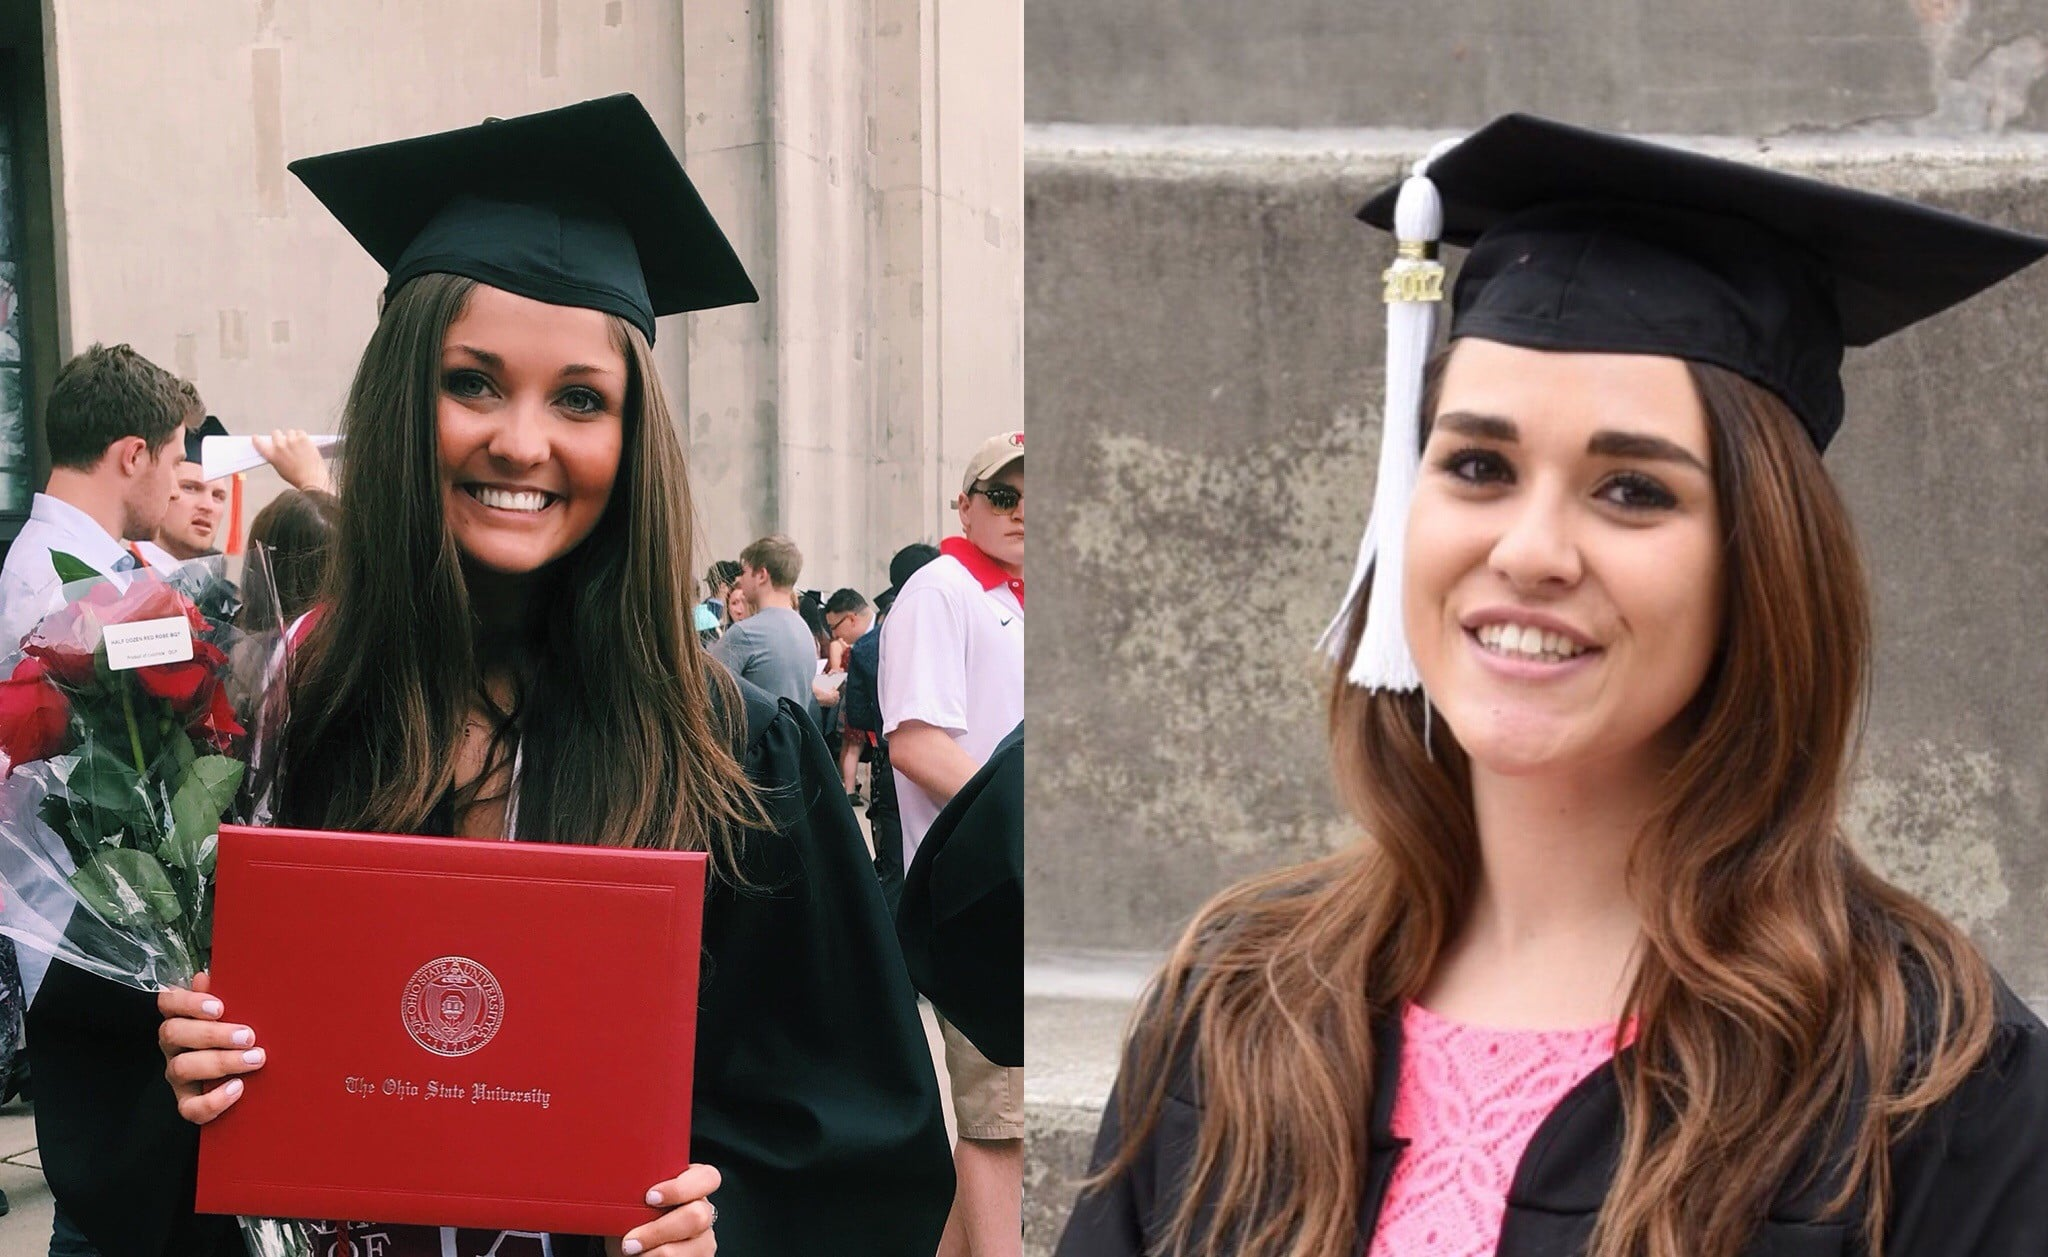 #WardWednesday- Happy Graduation Christi & Mary!